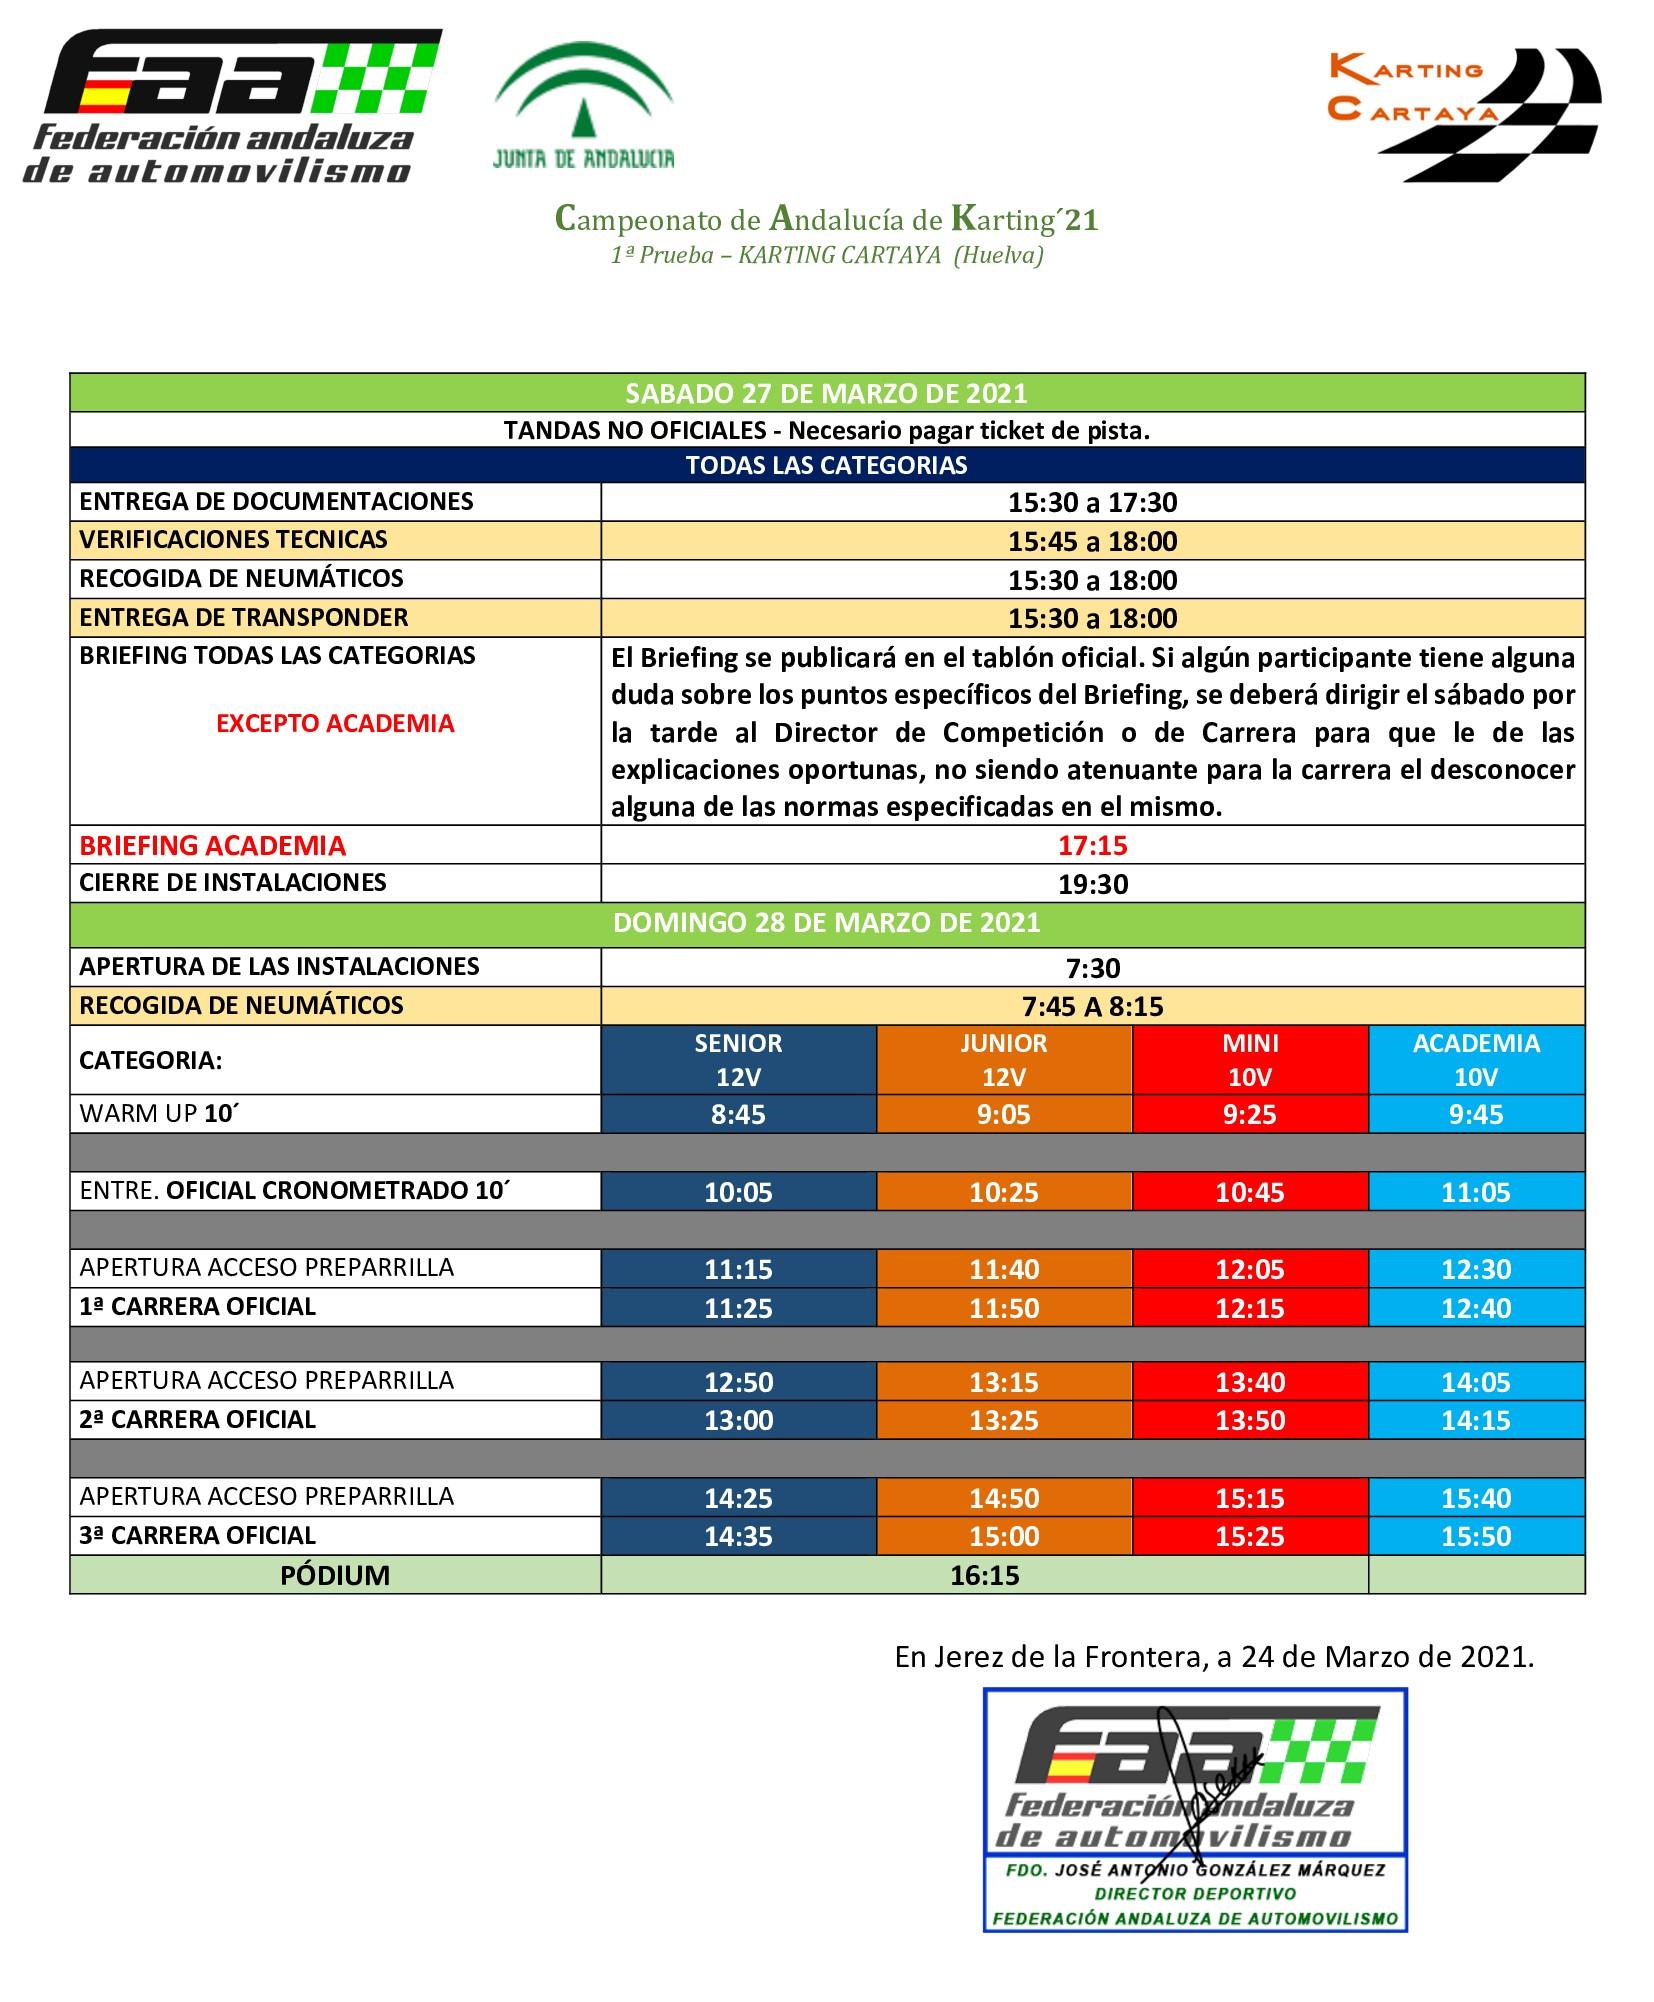 Horarios Campeonato Andalucía Karting - Cartaya